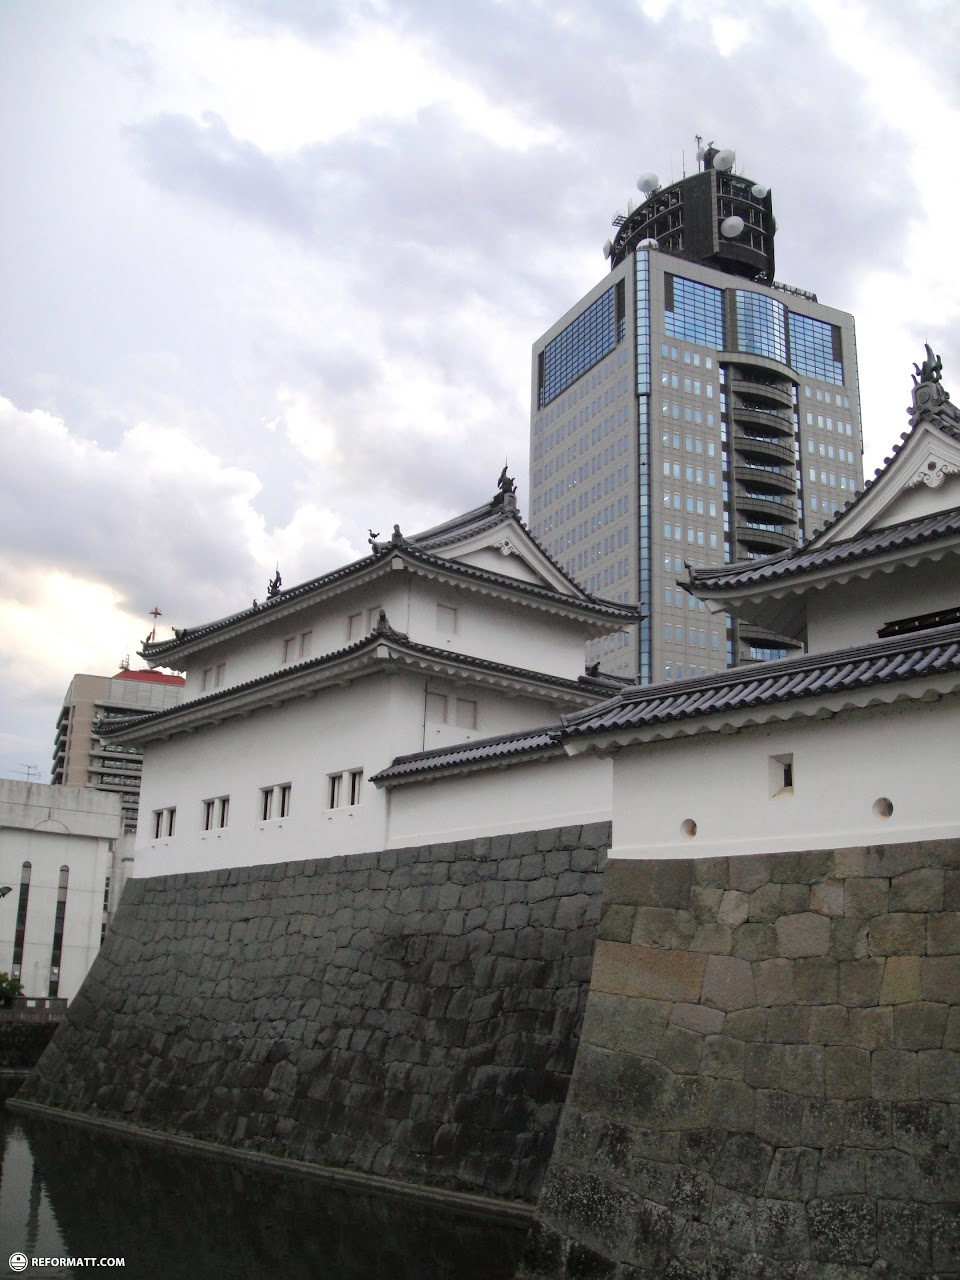 Att Com Port >> Shinkansen Stopover In Shizuoka For A Taste Of Raw Tuna • Reformatt Travel Show